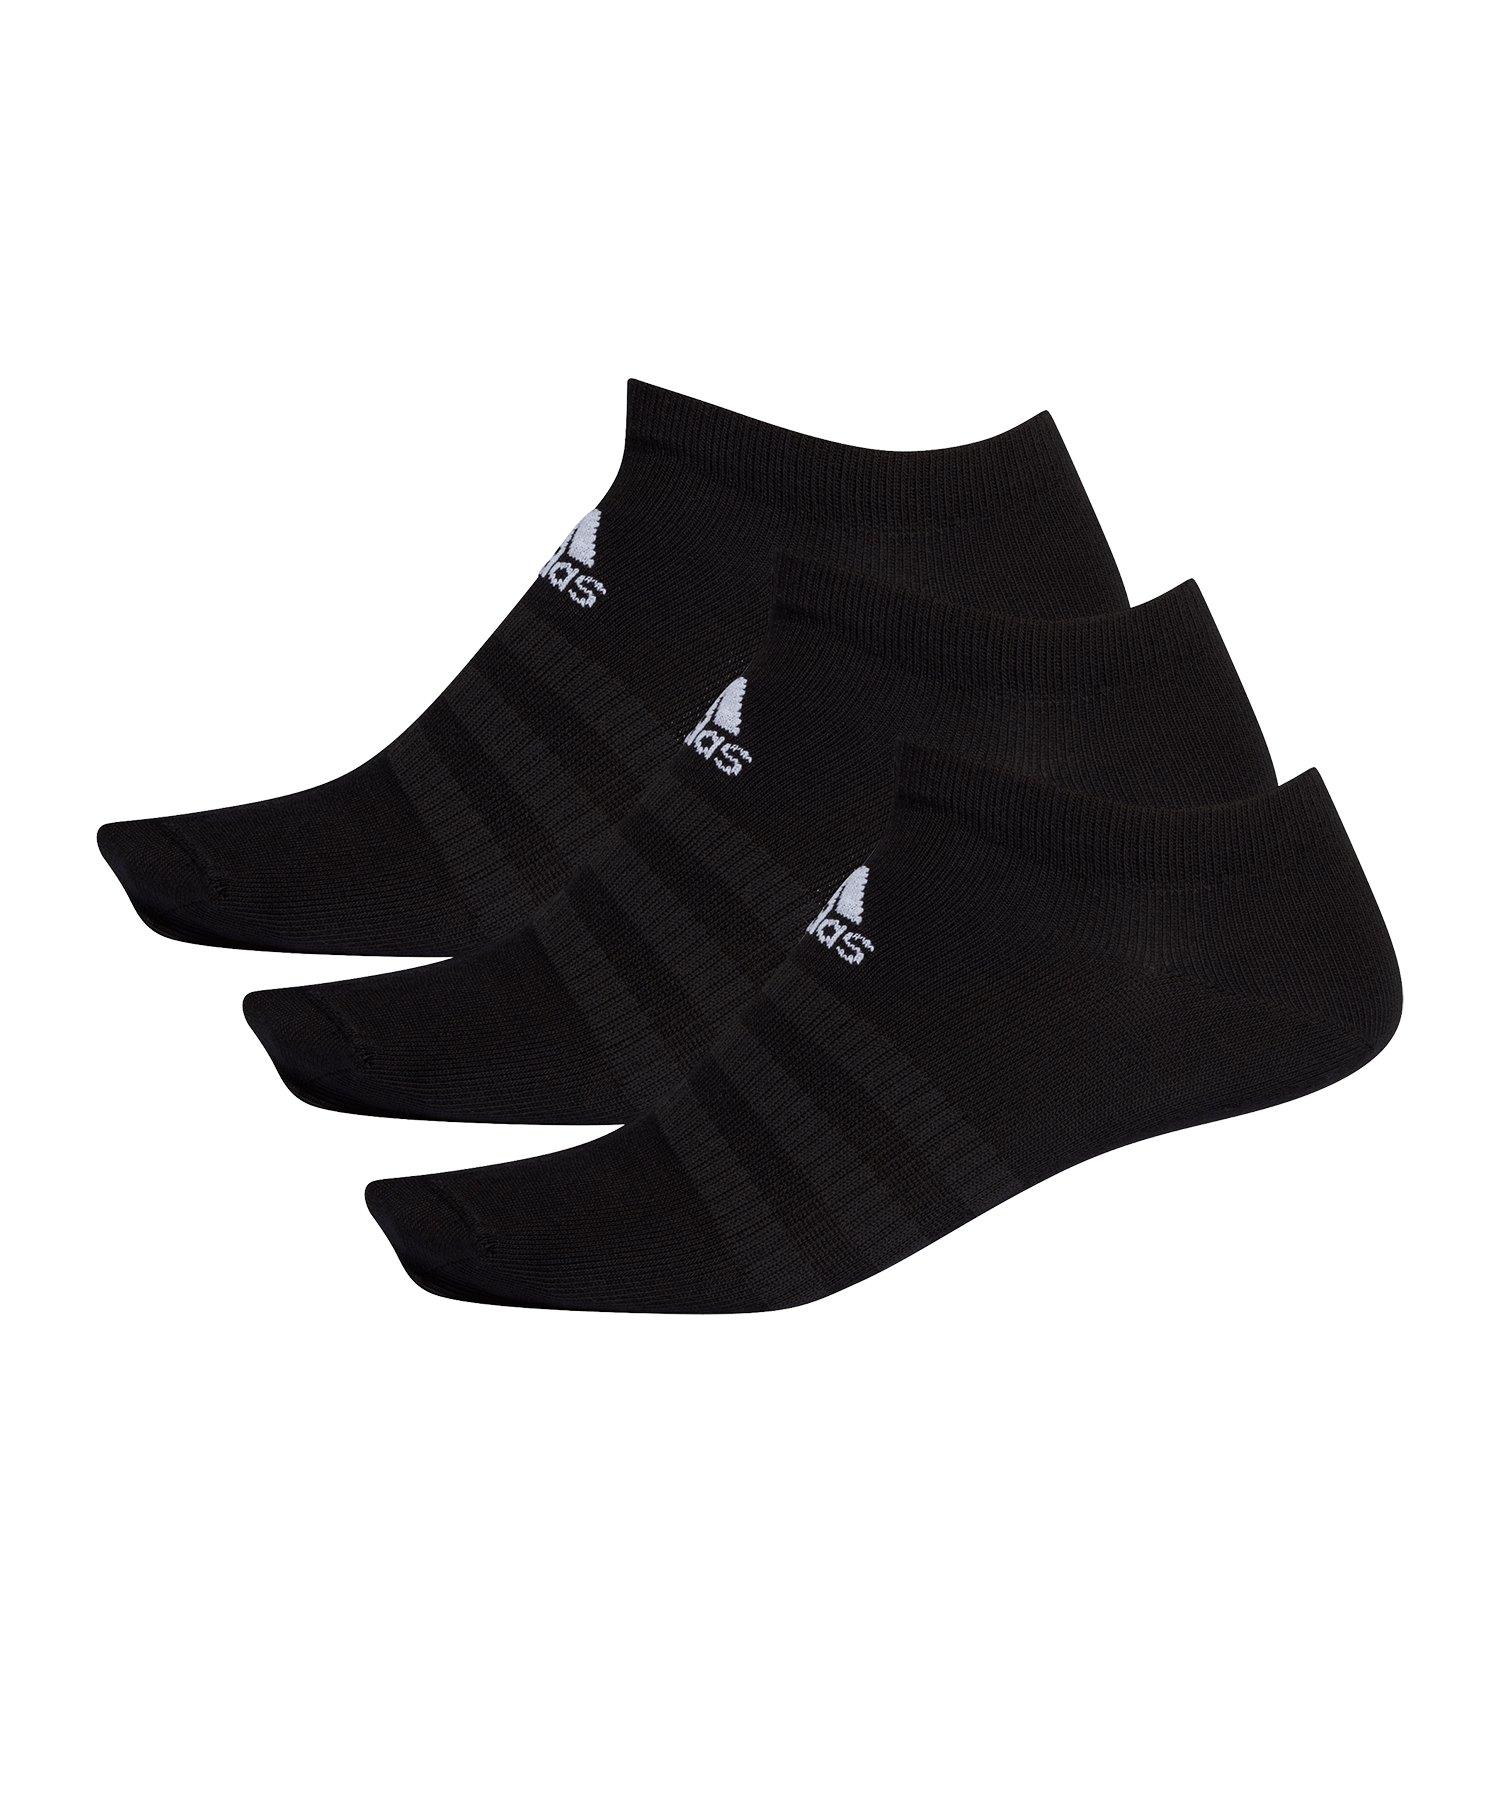 adidas Light Low Socken 3er Pack Schwarz - schwarz